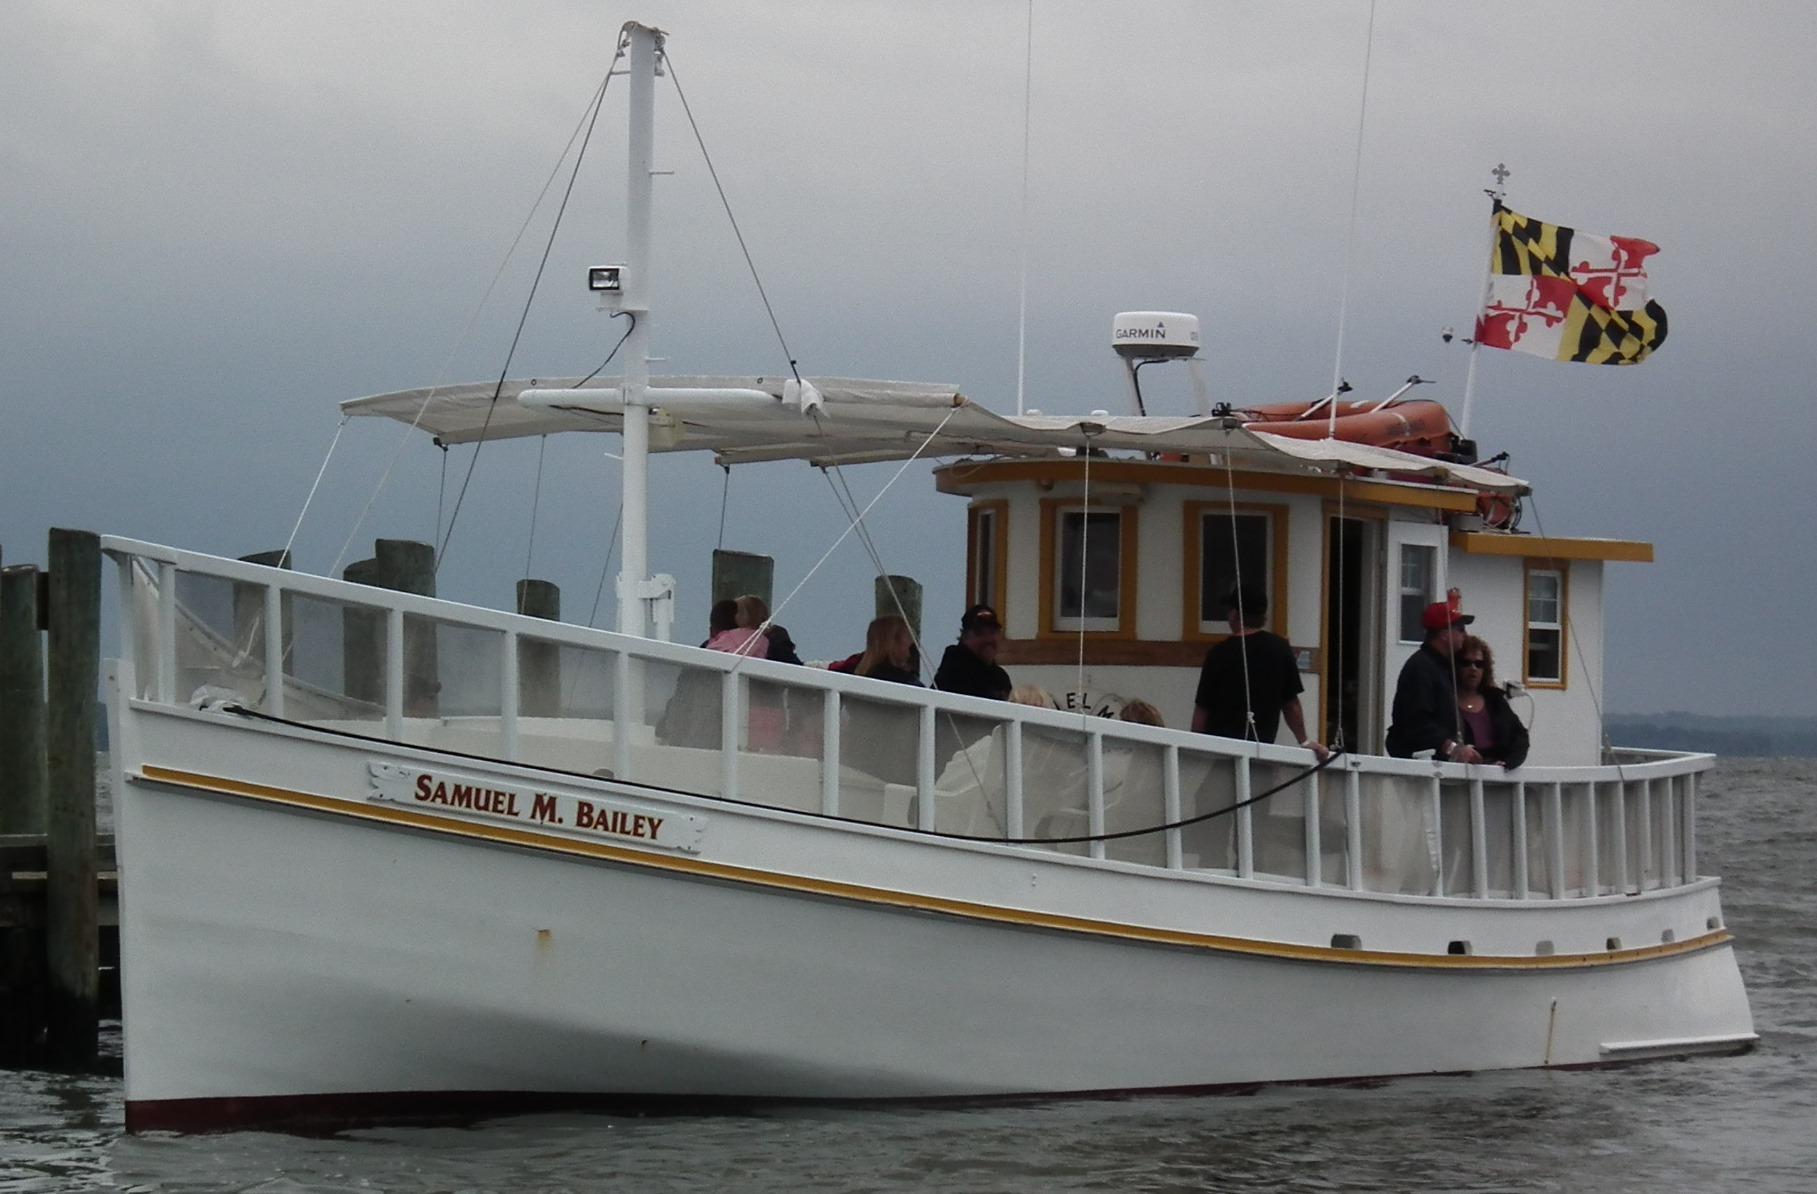 Samuel M Bailey on Potomac